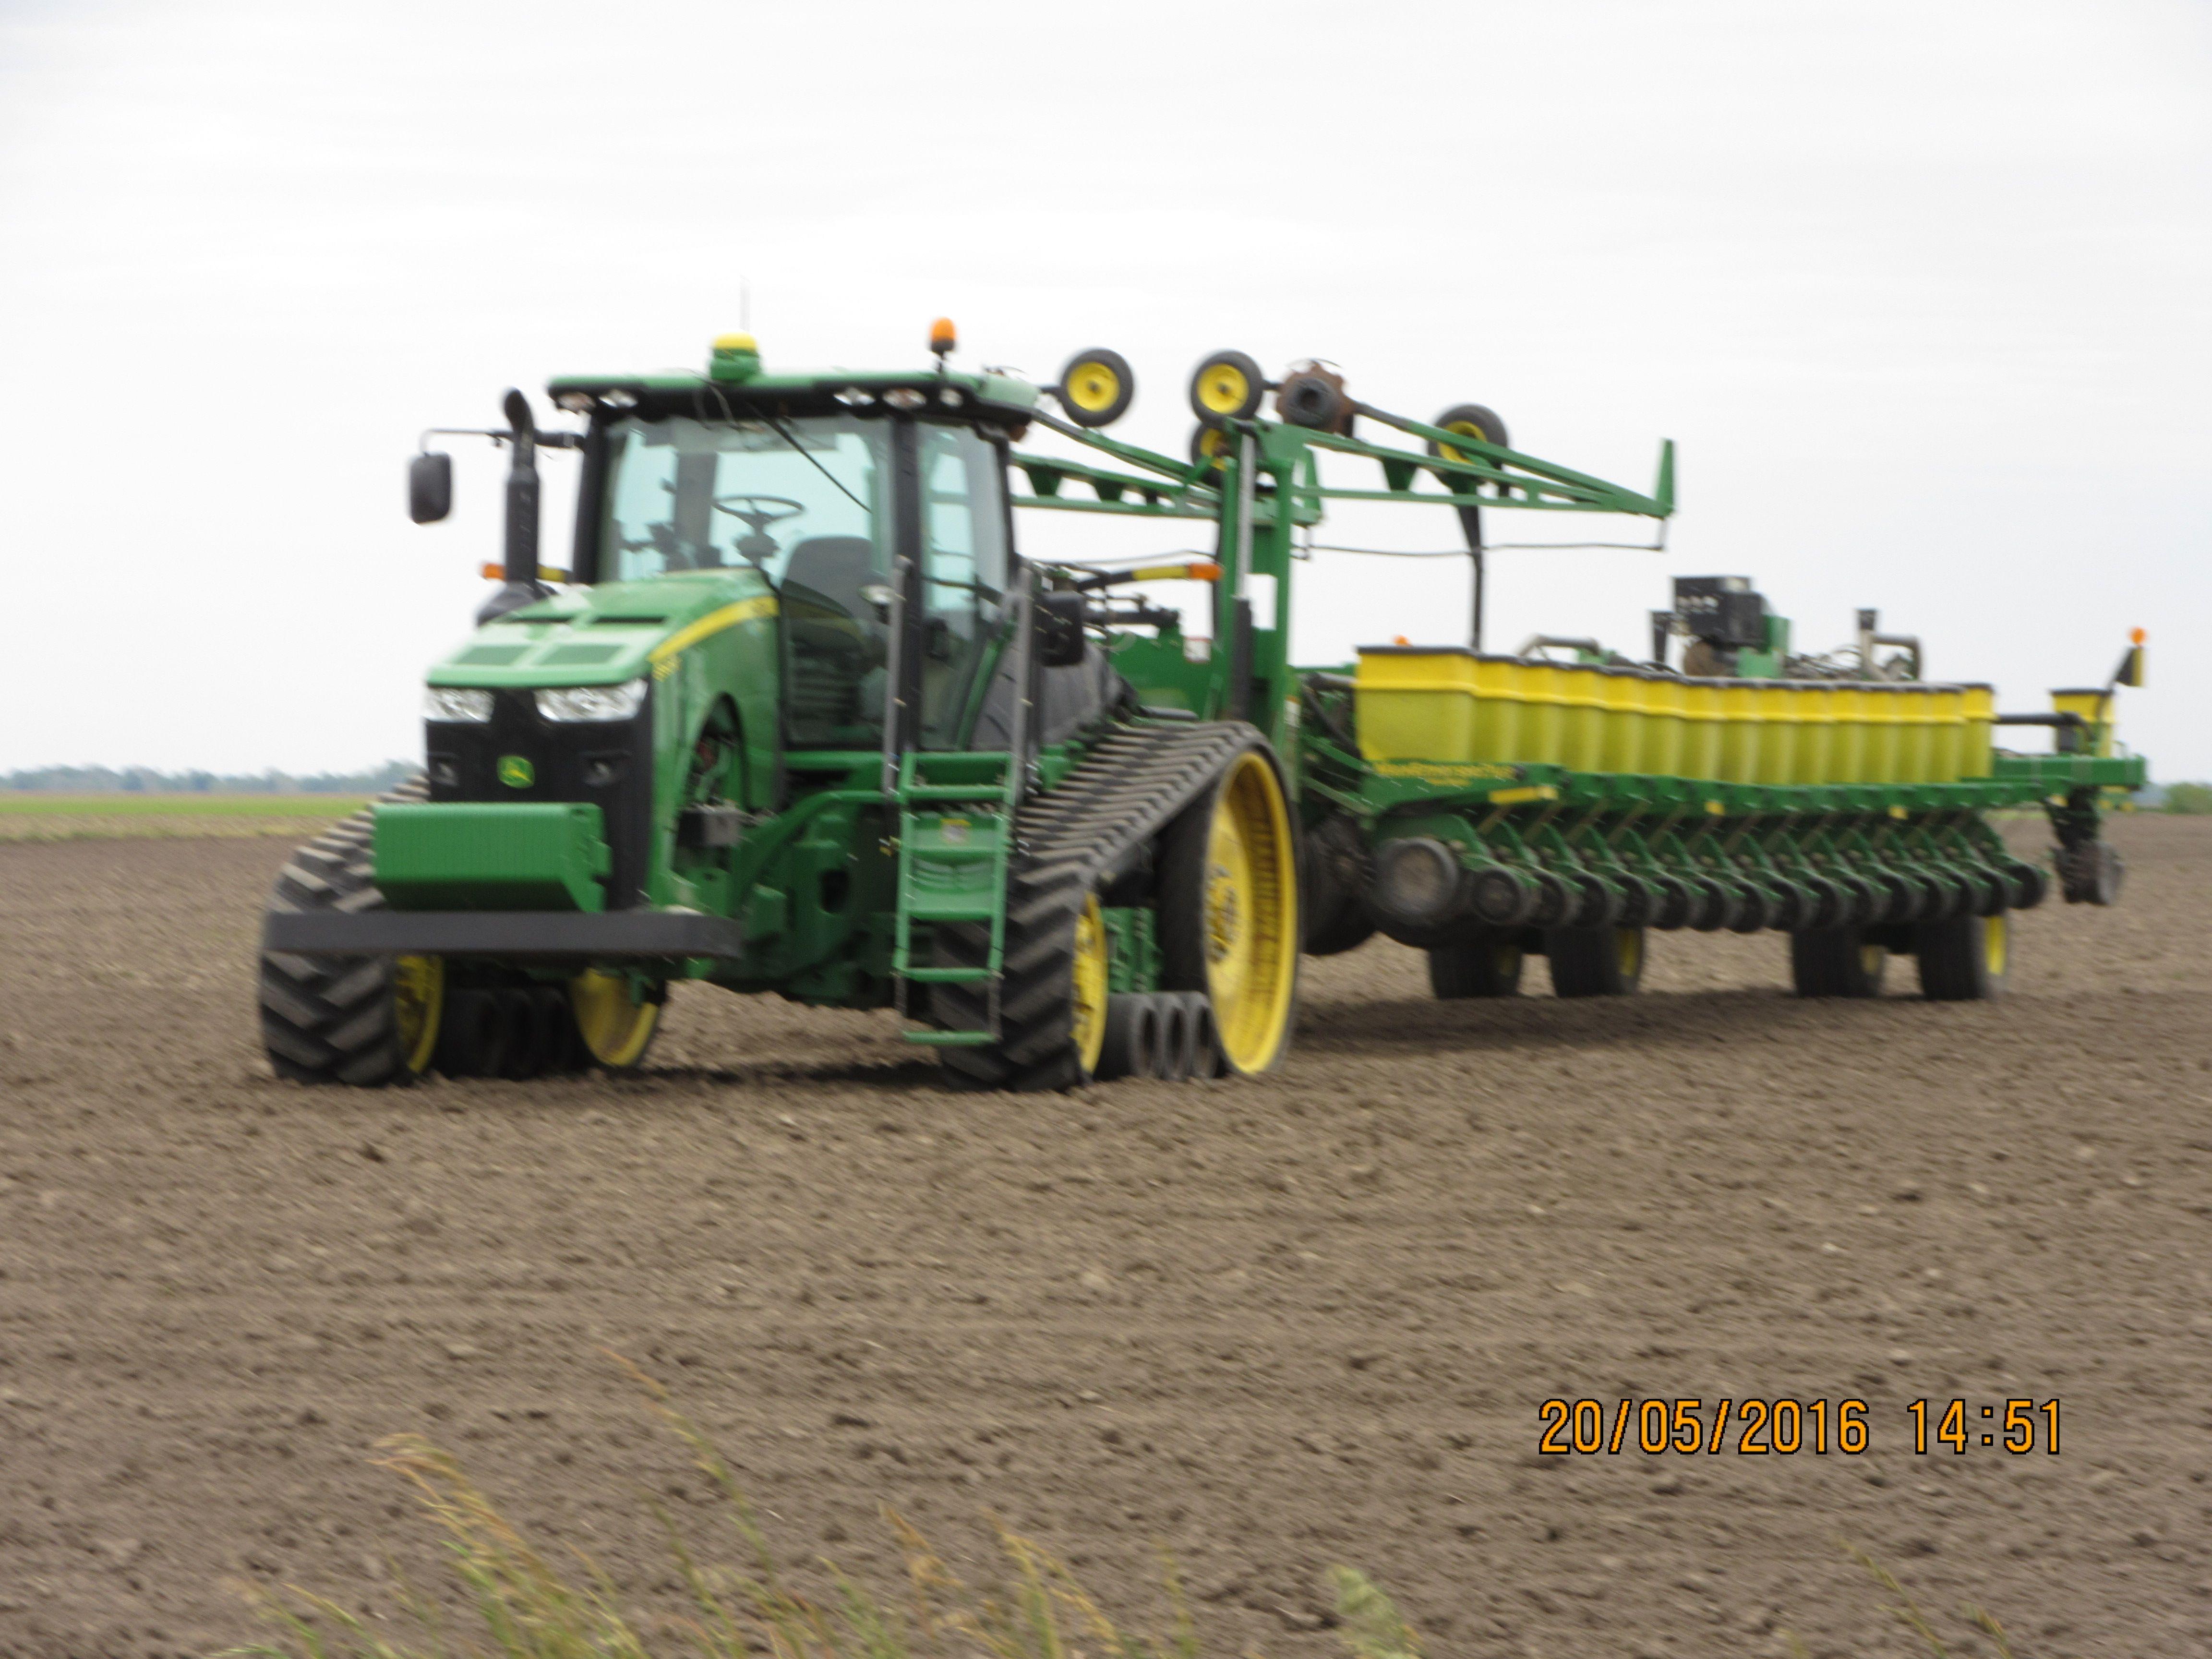 John Deere 8360rt Pulling A 36 Row Max Emerge Corn Planter John